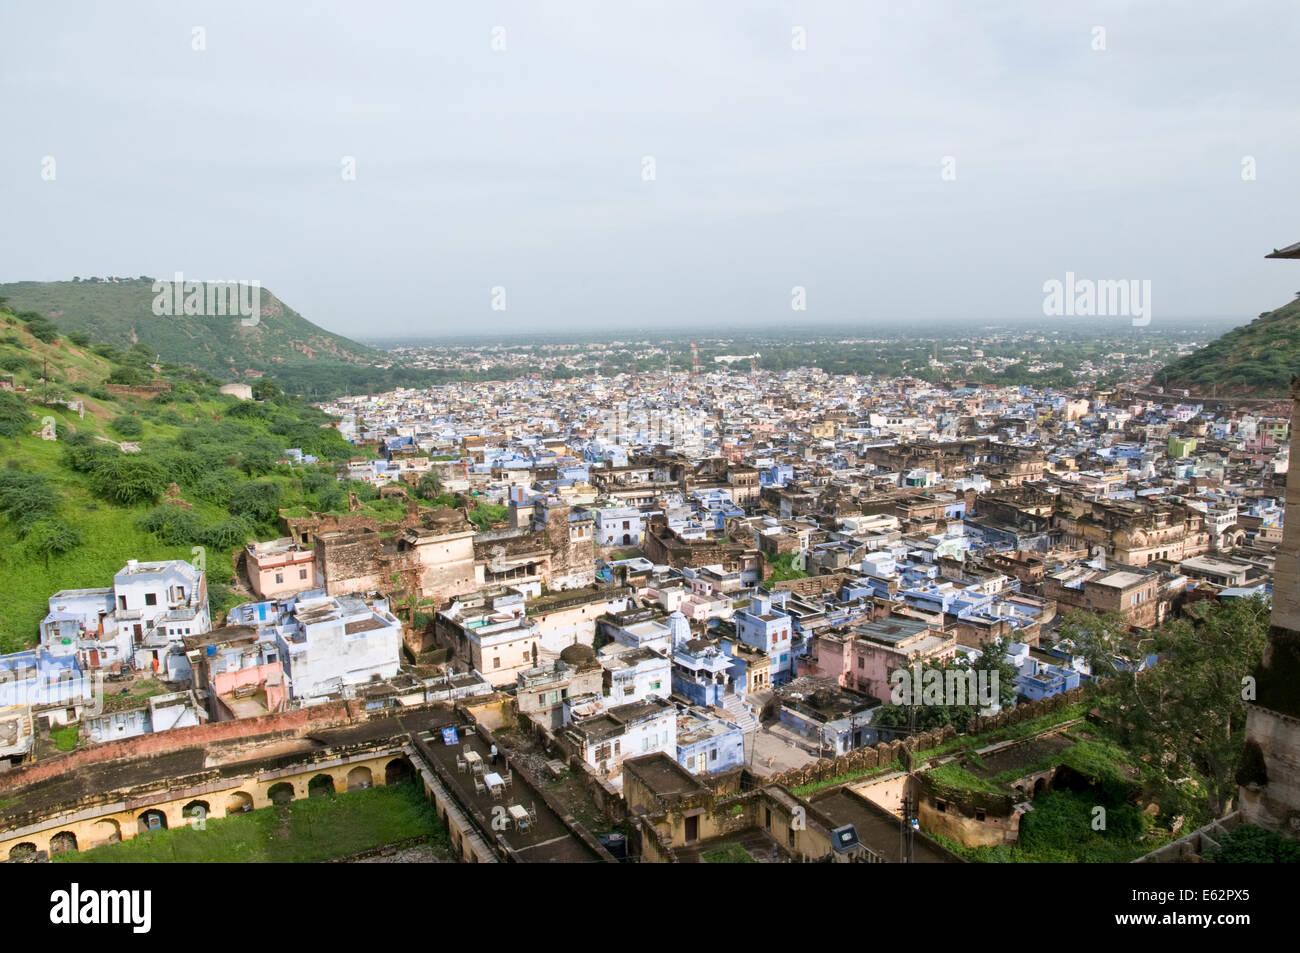 View across the town of Bundi, Rajasthan. - Stock Image